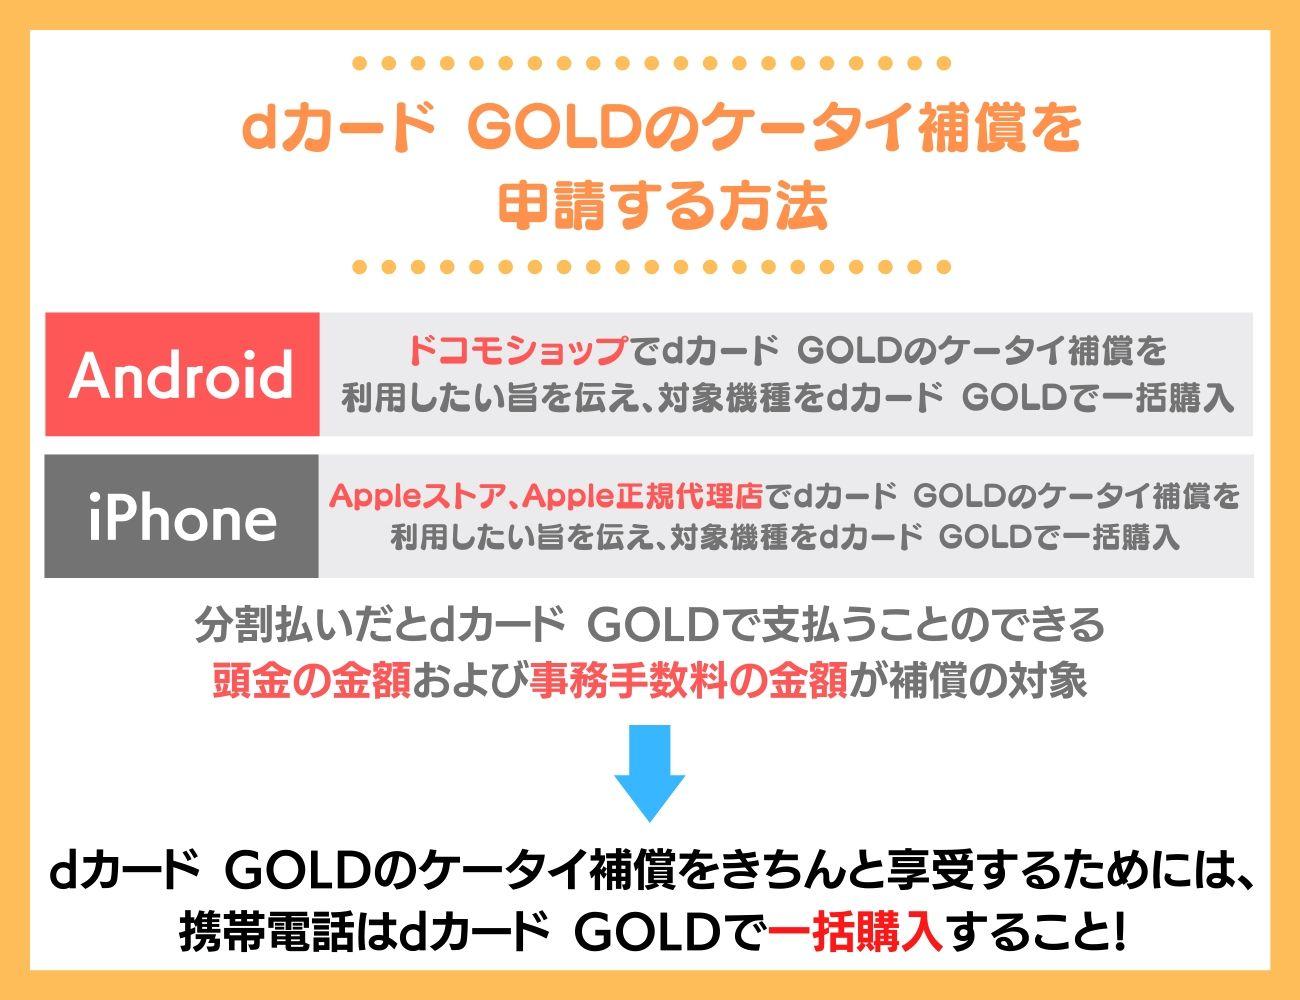 dカード GOLDのケータイ補償を申請する方法